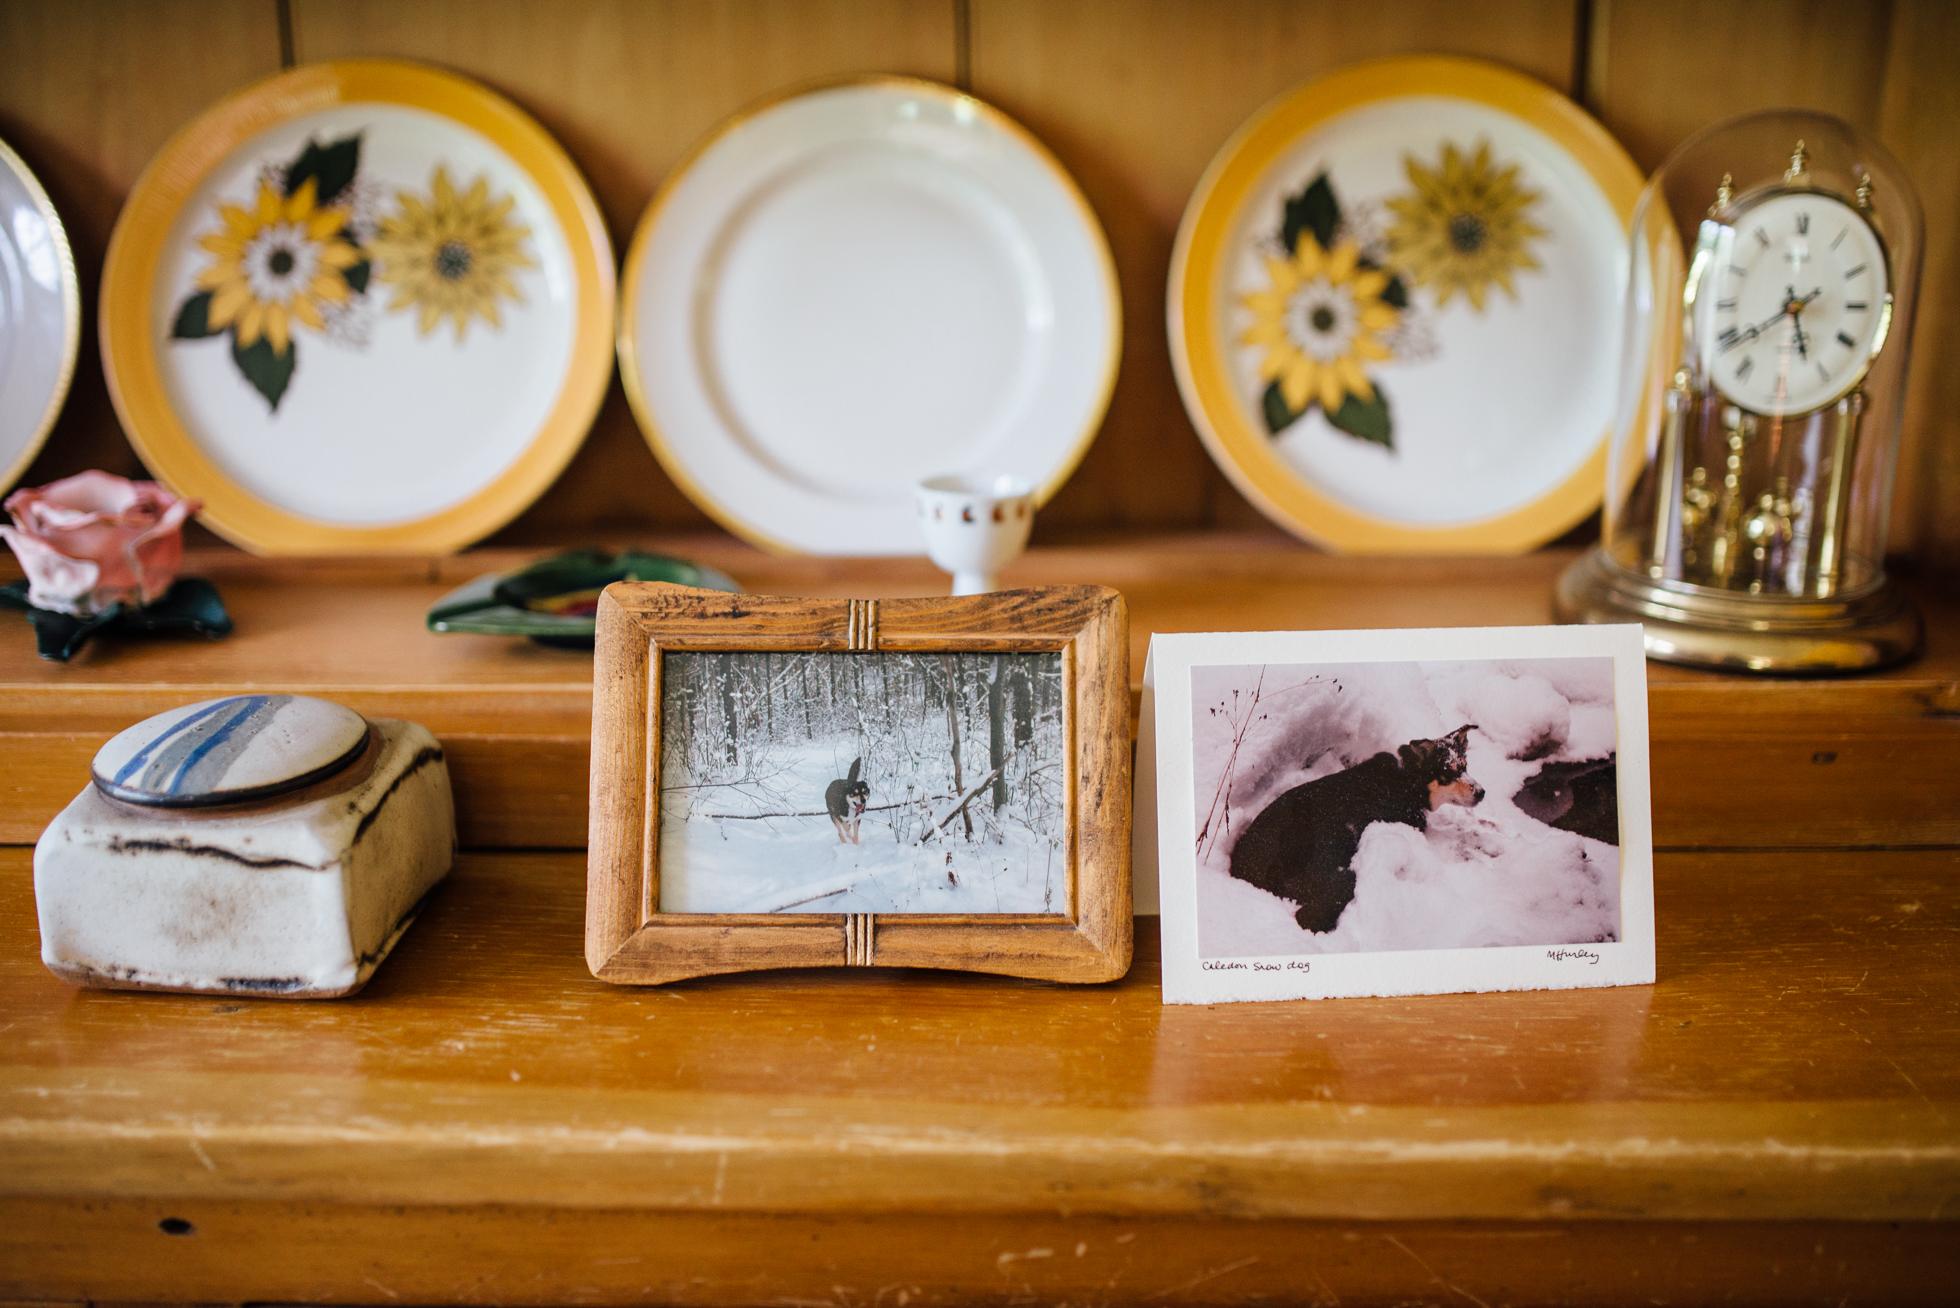 Outdoor-Caledon-Tralee-Wedding-Photography-26